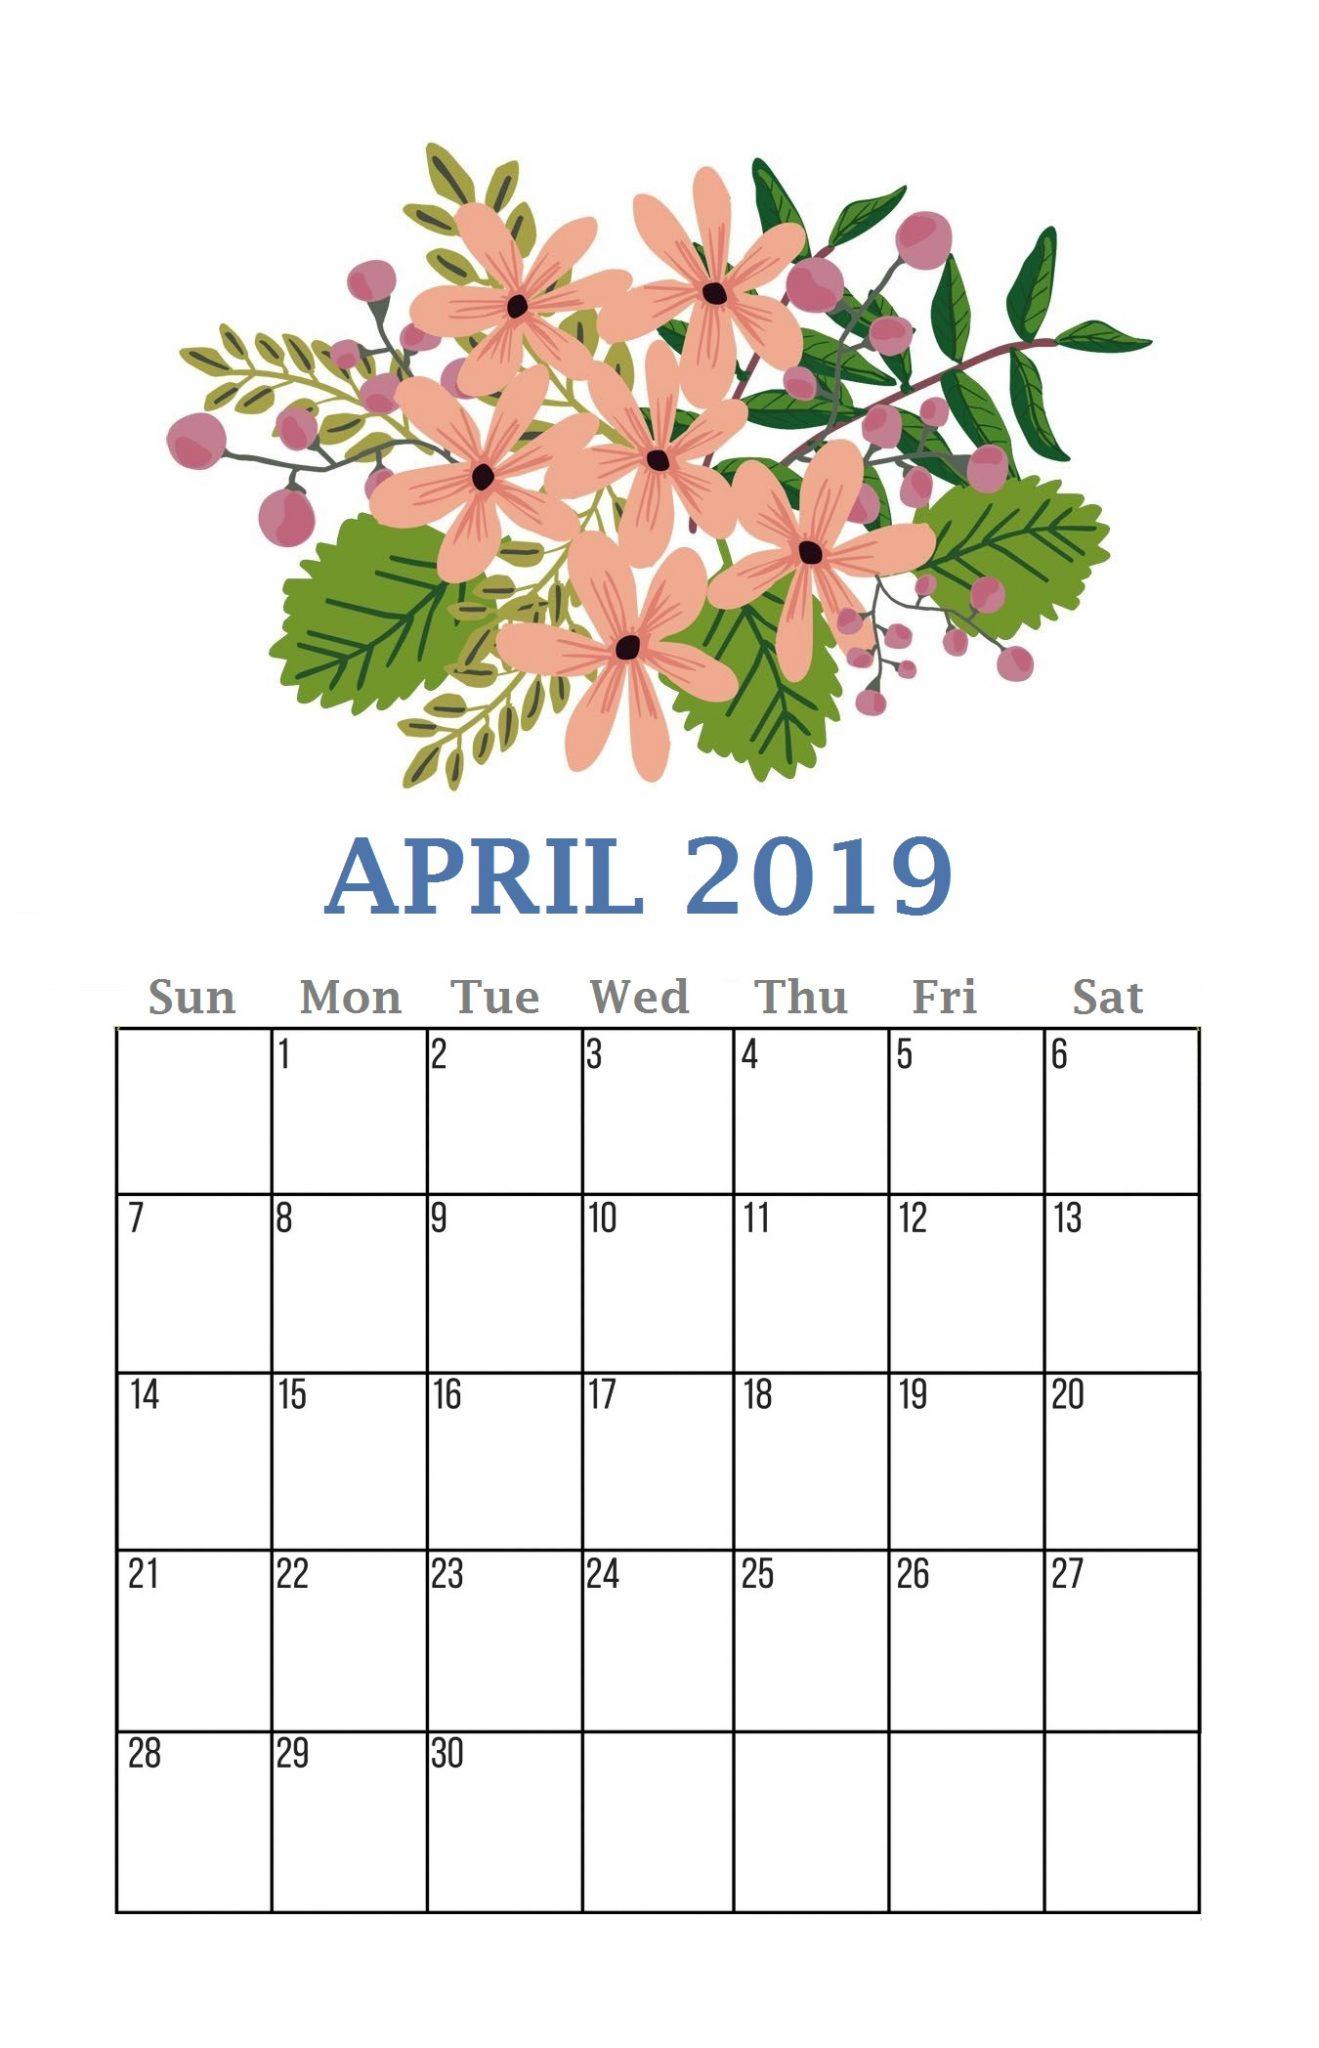 Floral April 2019 Calendar Template